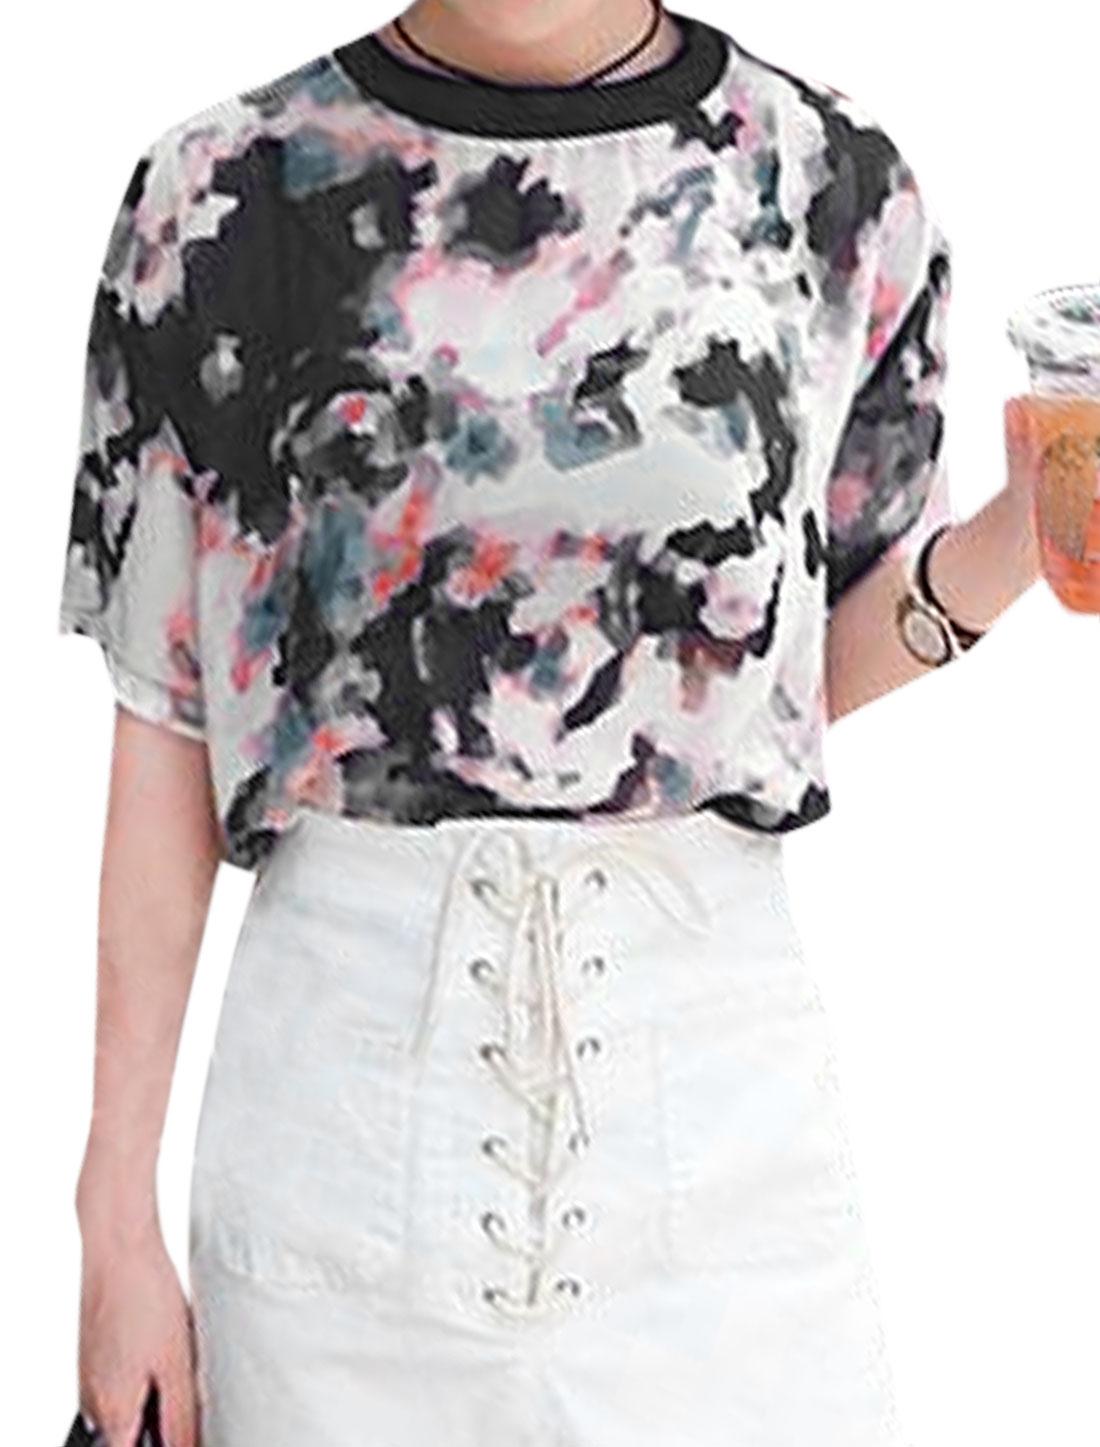 Women Crew Neck Novelty Prints Casual Retro Tee Shirt Pink Black S